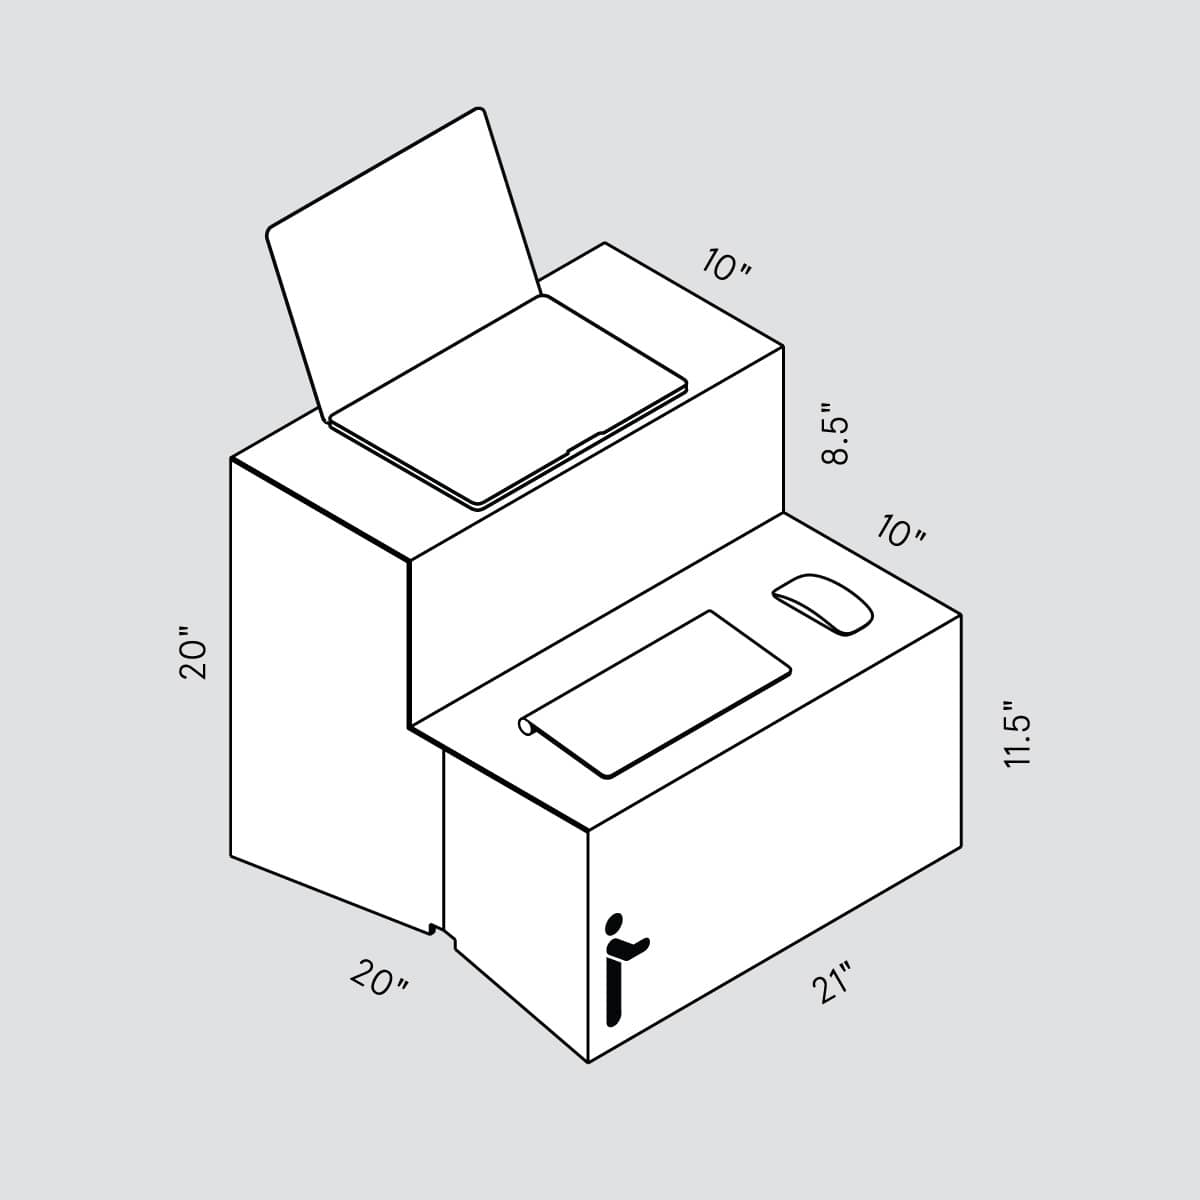 oristand_dimensions